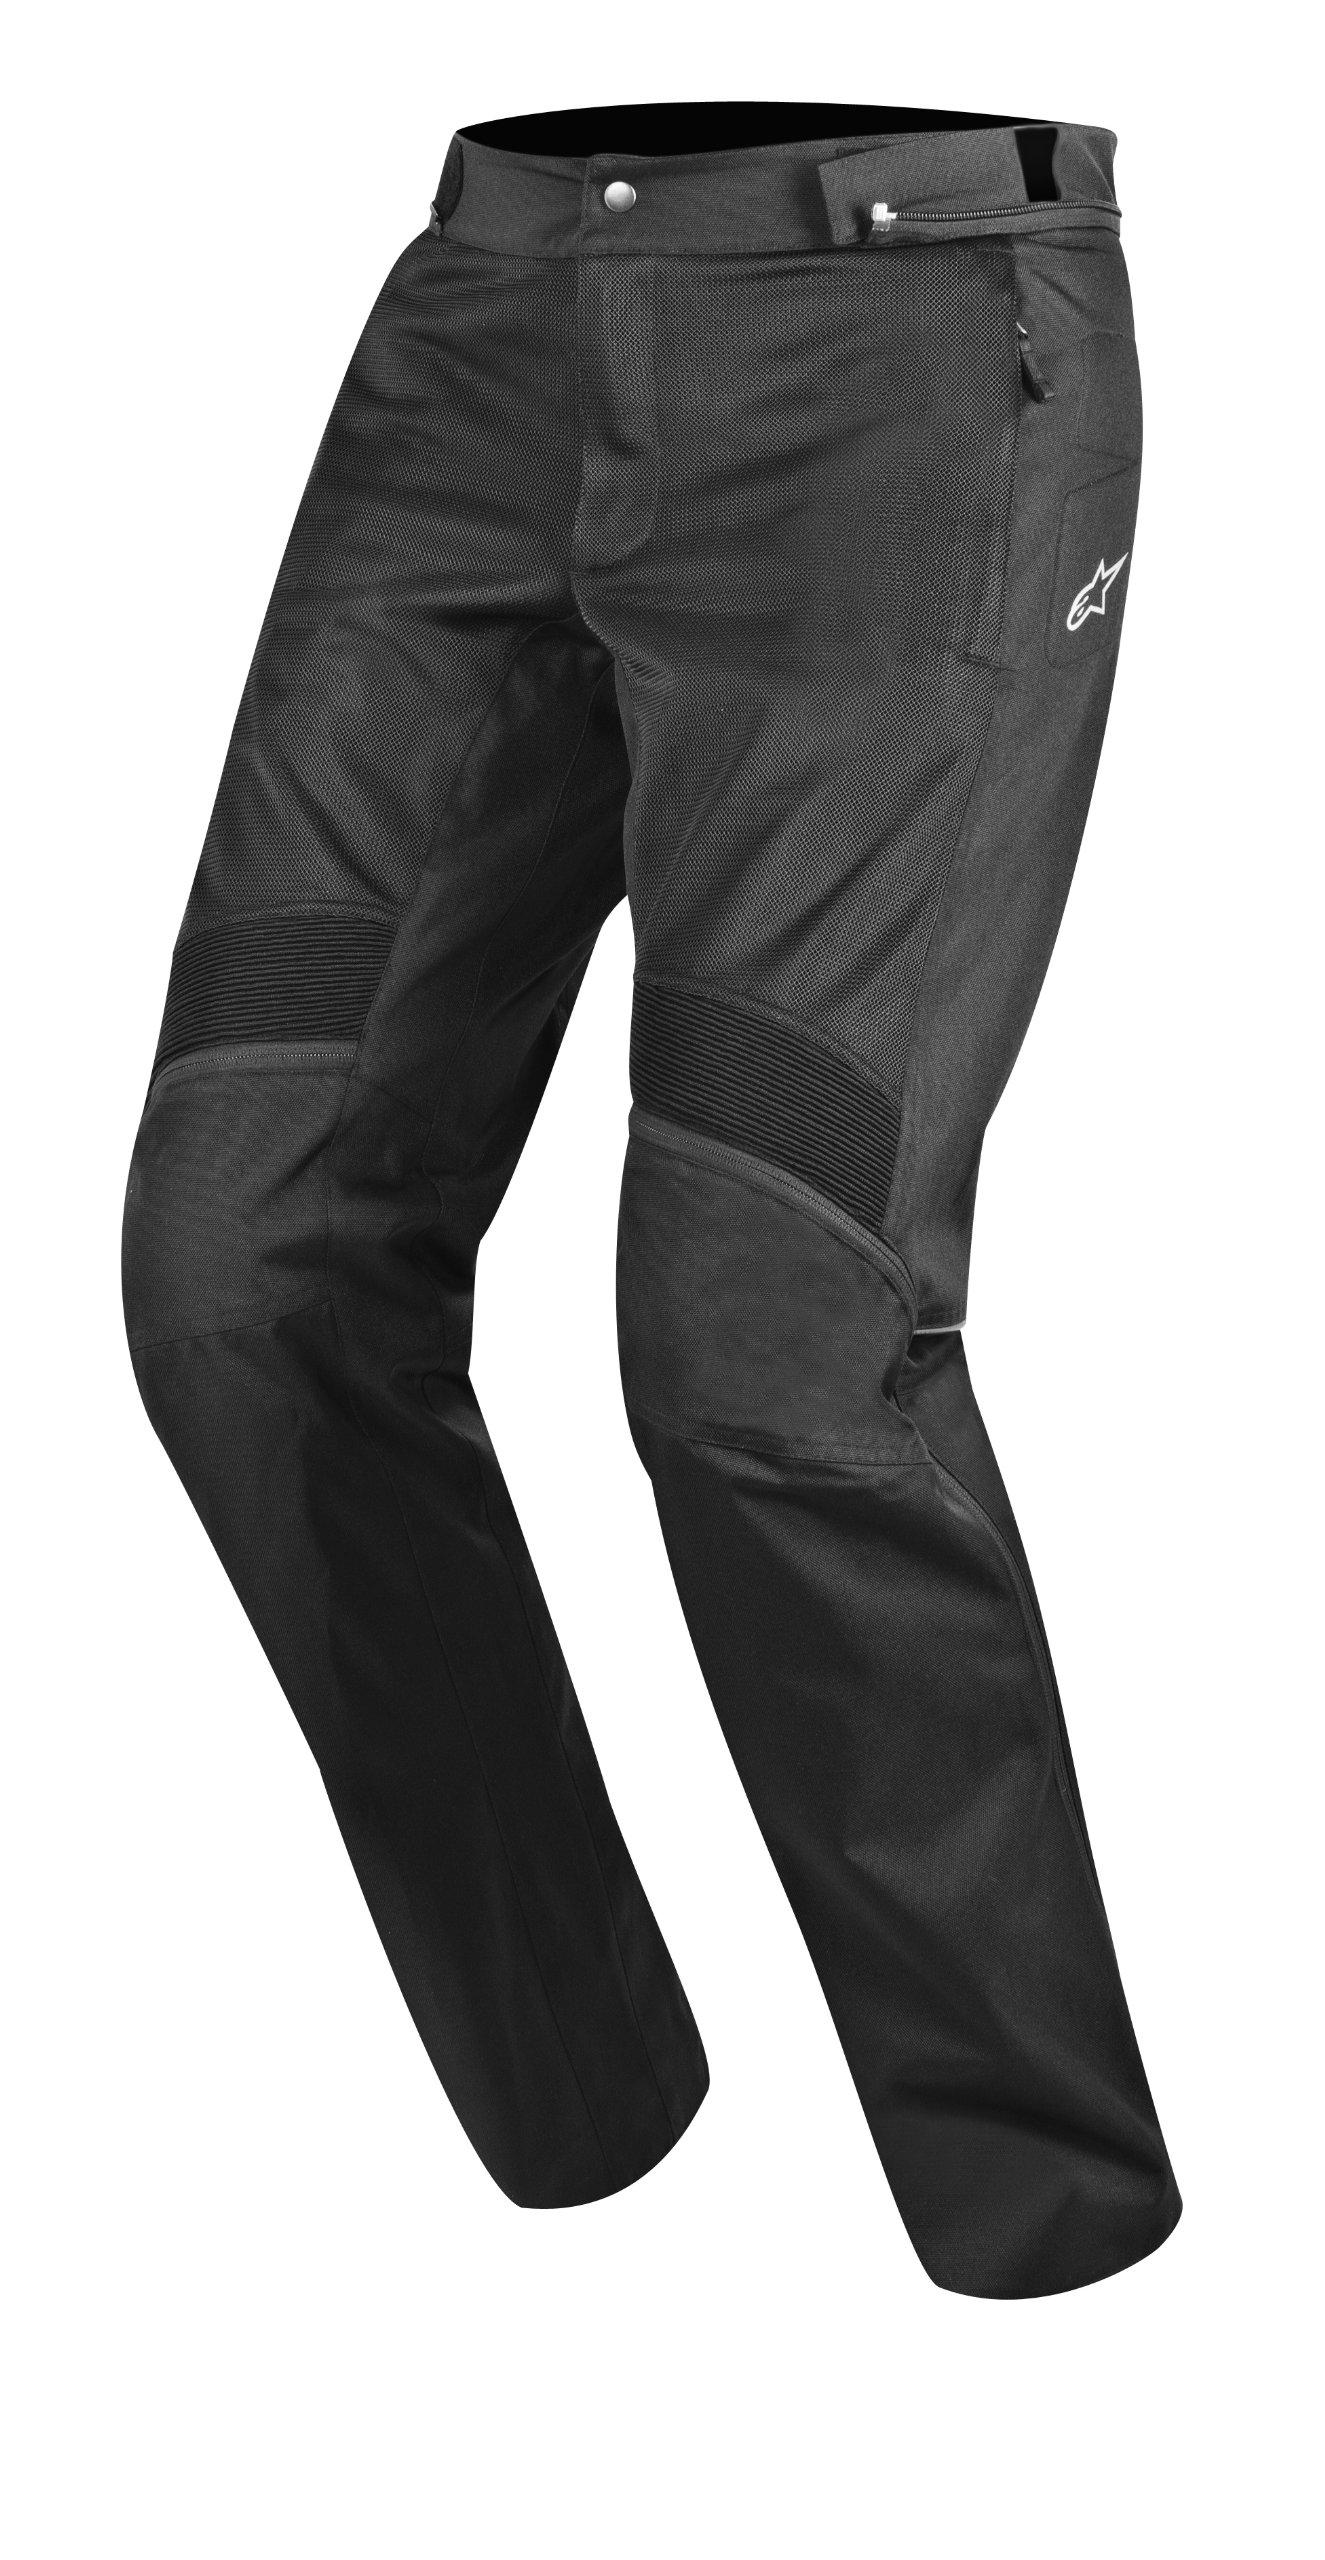 Alpinestars Oxygen Air Men's Sports Bike Motorcycle Pants - Black / Size Small by Alpinestars